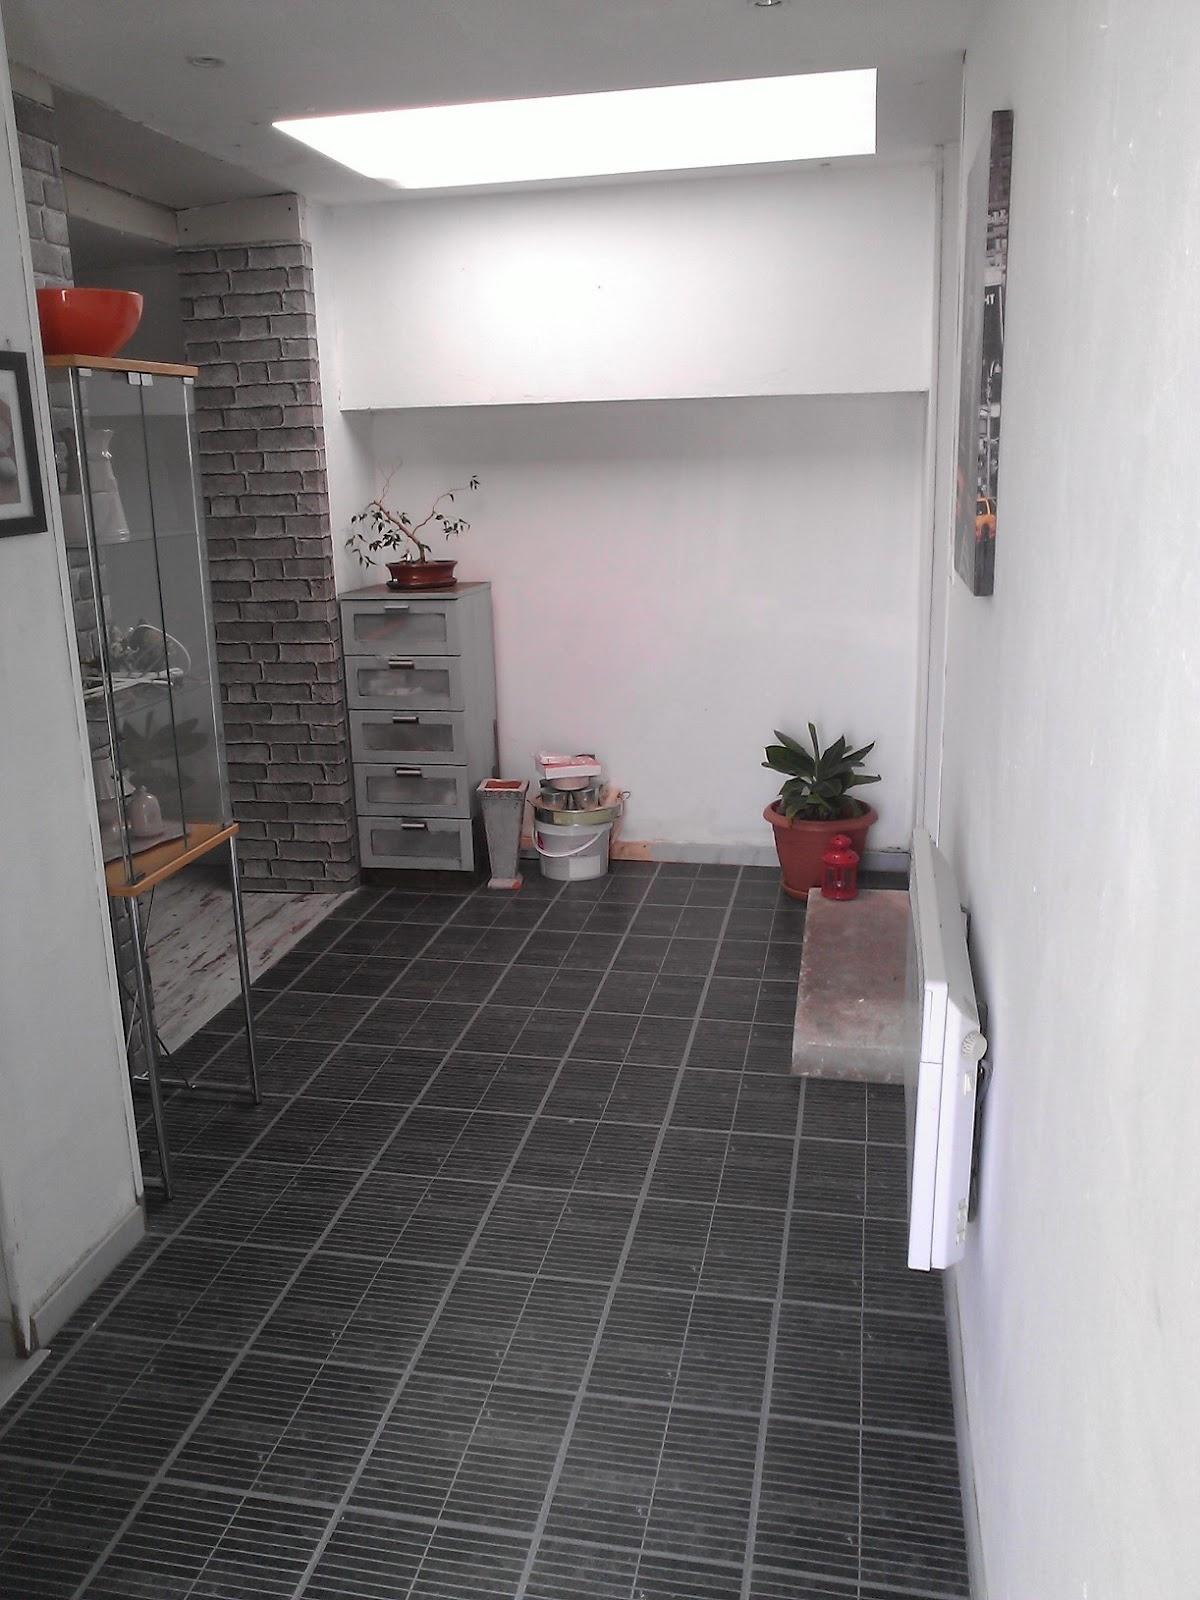 superb repeindre un mur deja peint 14 entr. Black Bedroom Furniture Sets. Home Design Ideas